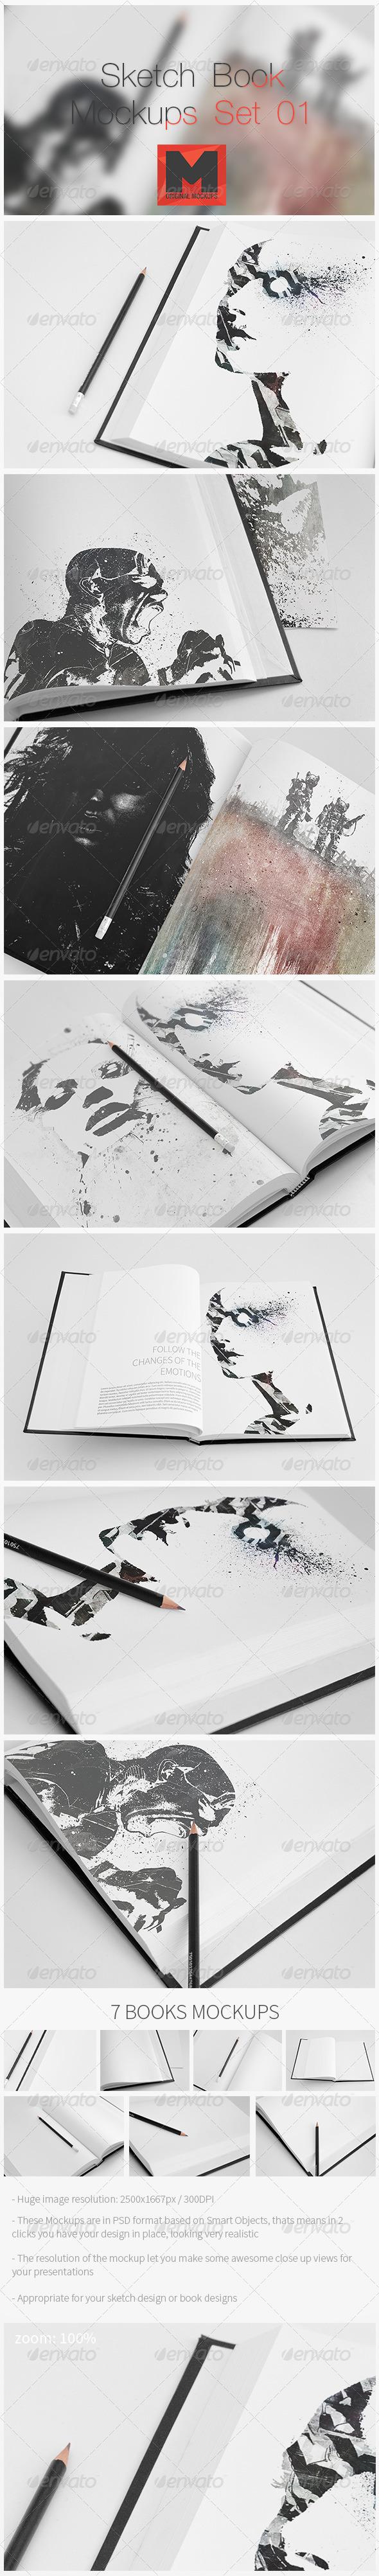 Sketch Book Mock-Ups - Set 01 - Books Print